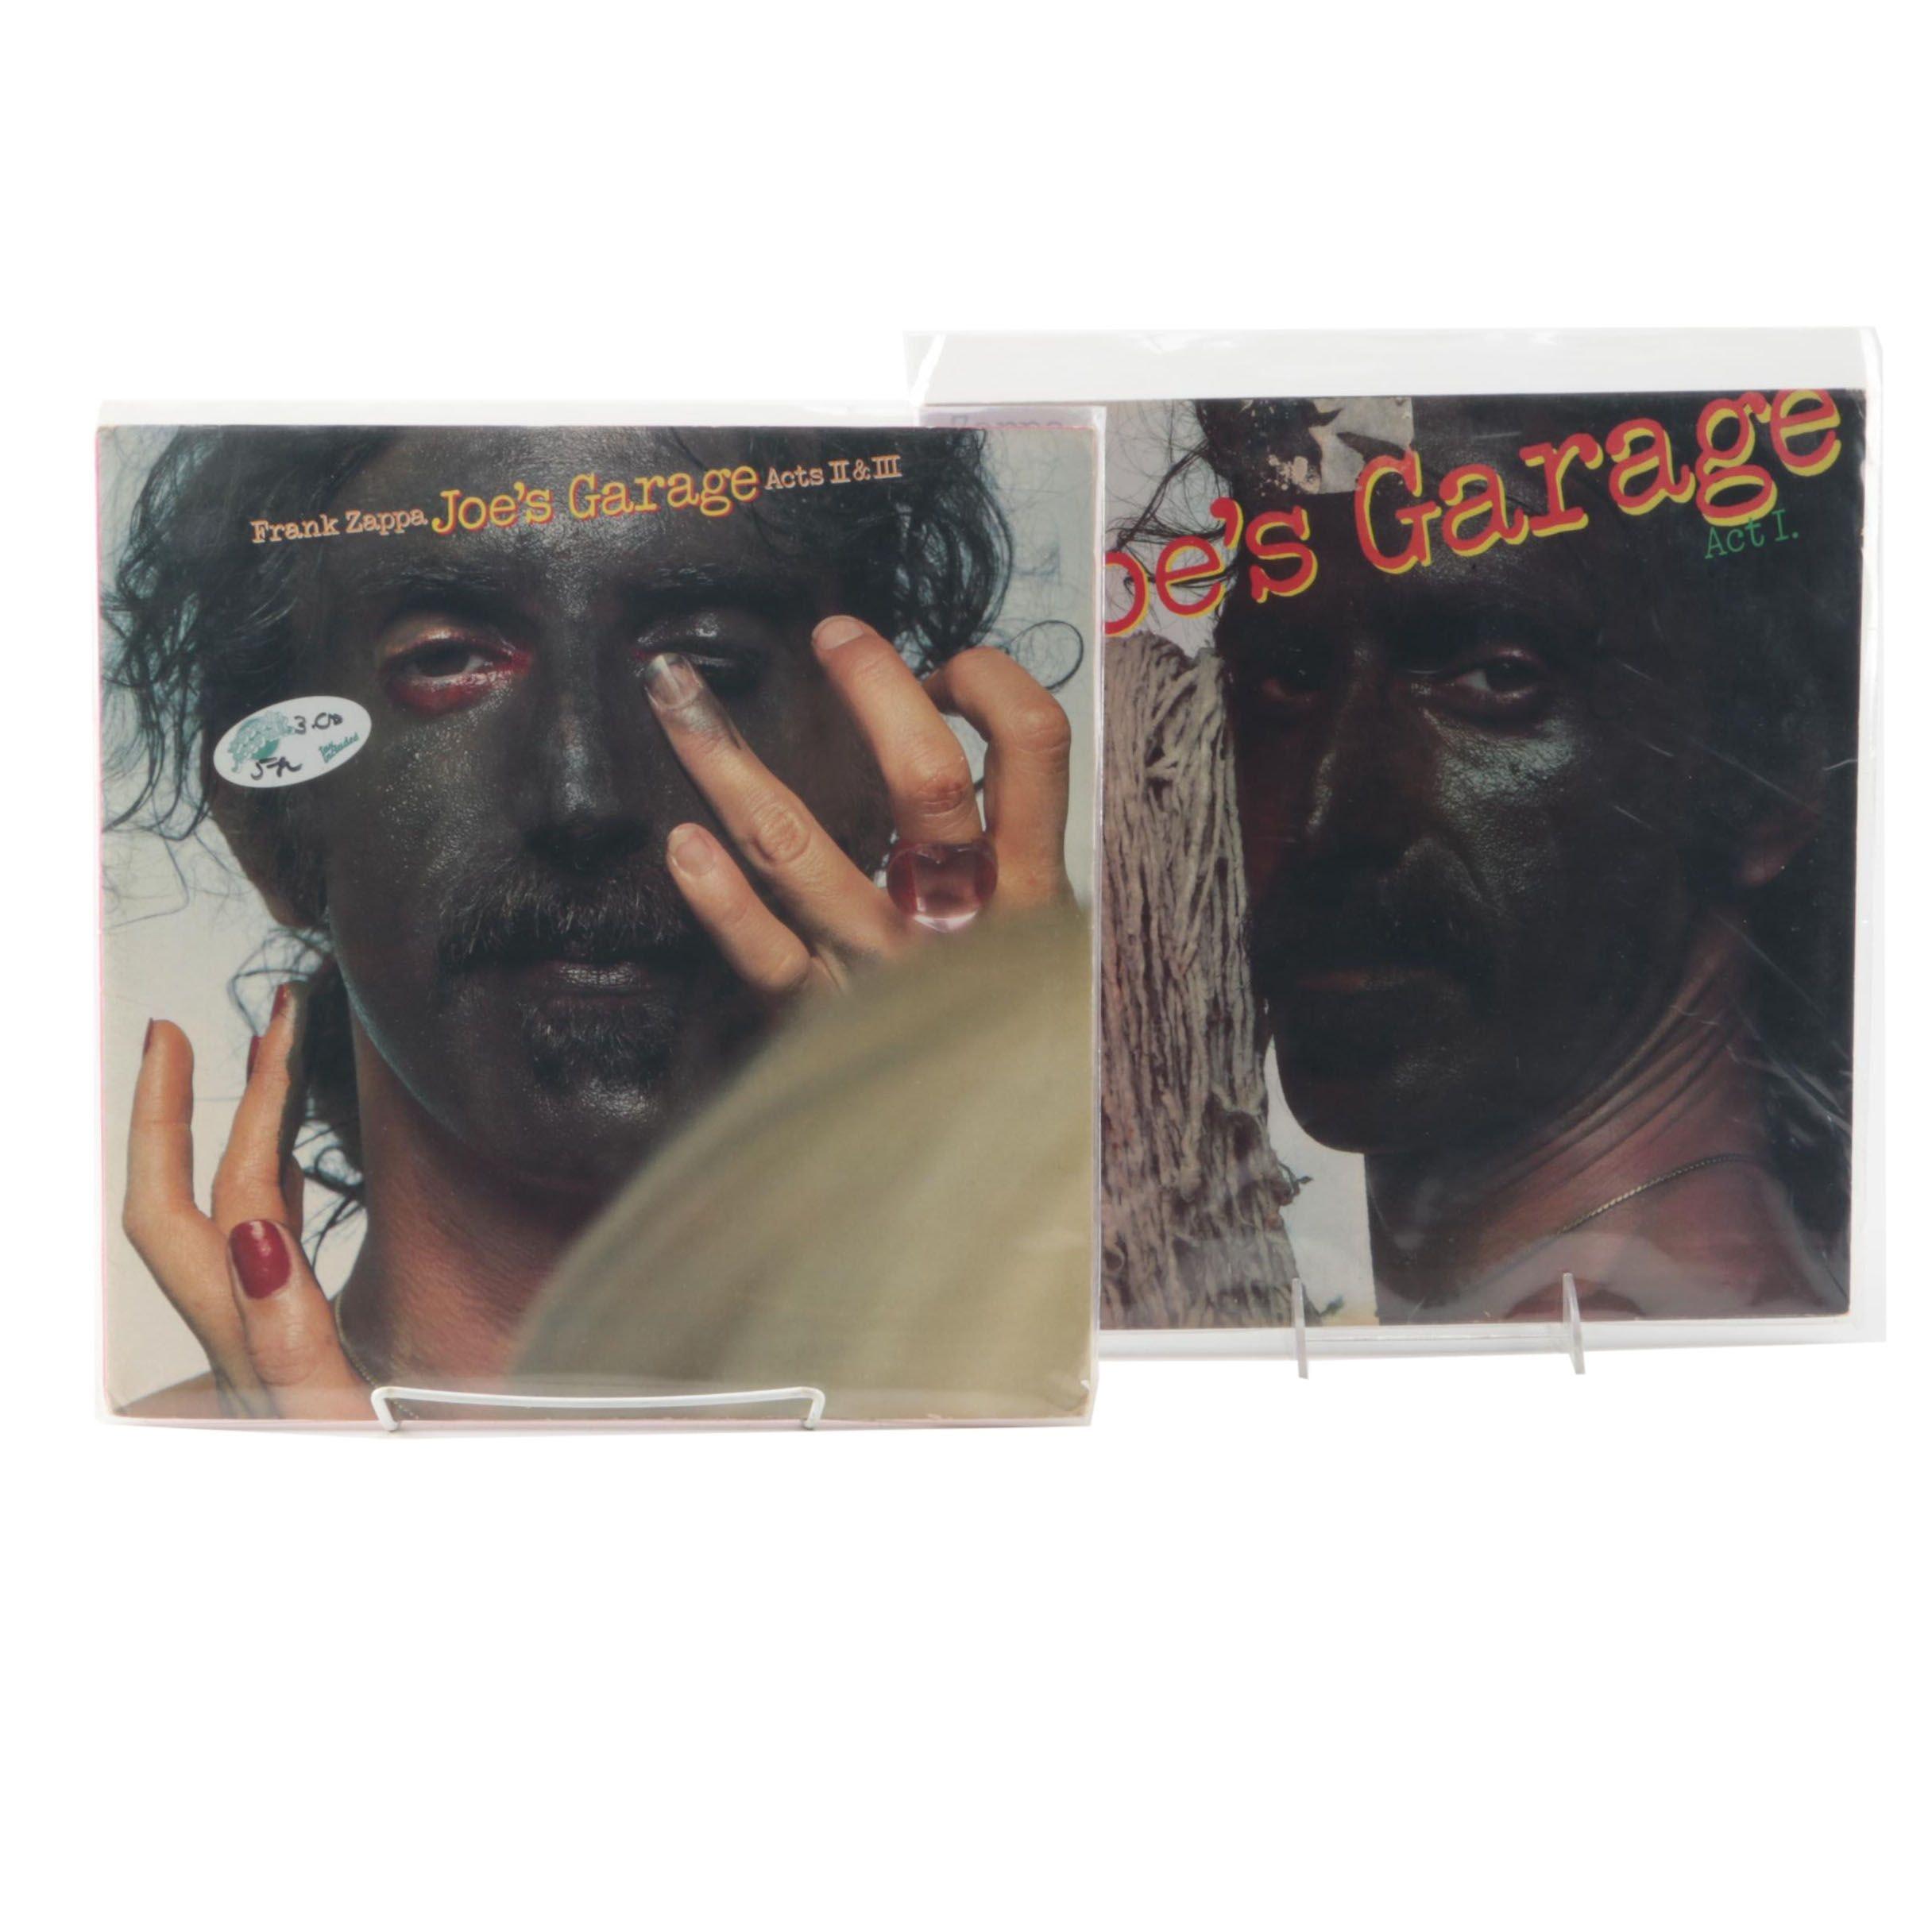 "Frank Zappa ""Joe's Garage Act I"" and ""Joe's Garage Acts II & III"" LPs"